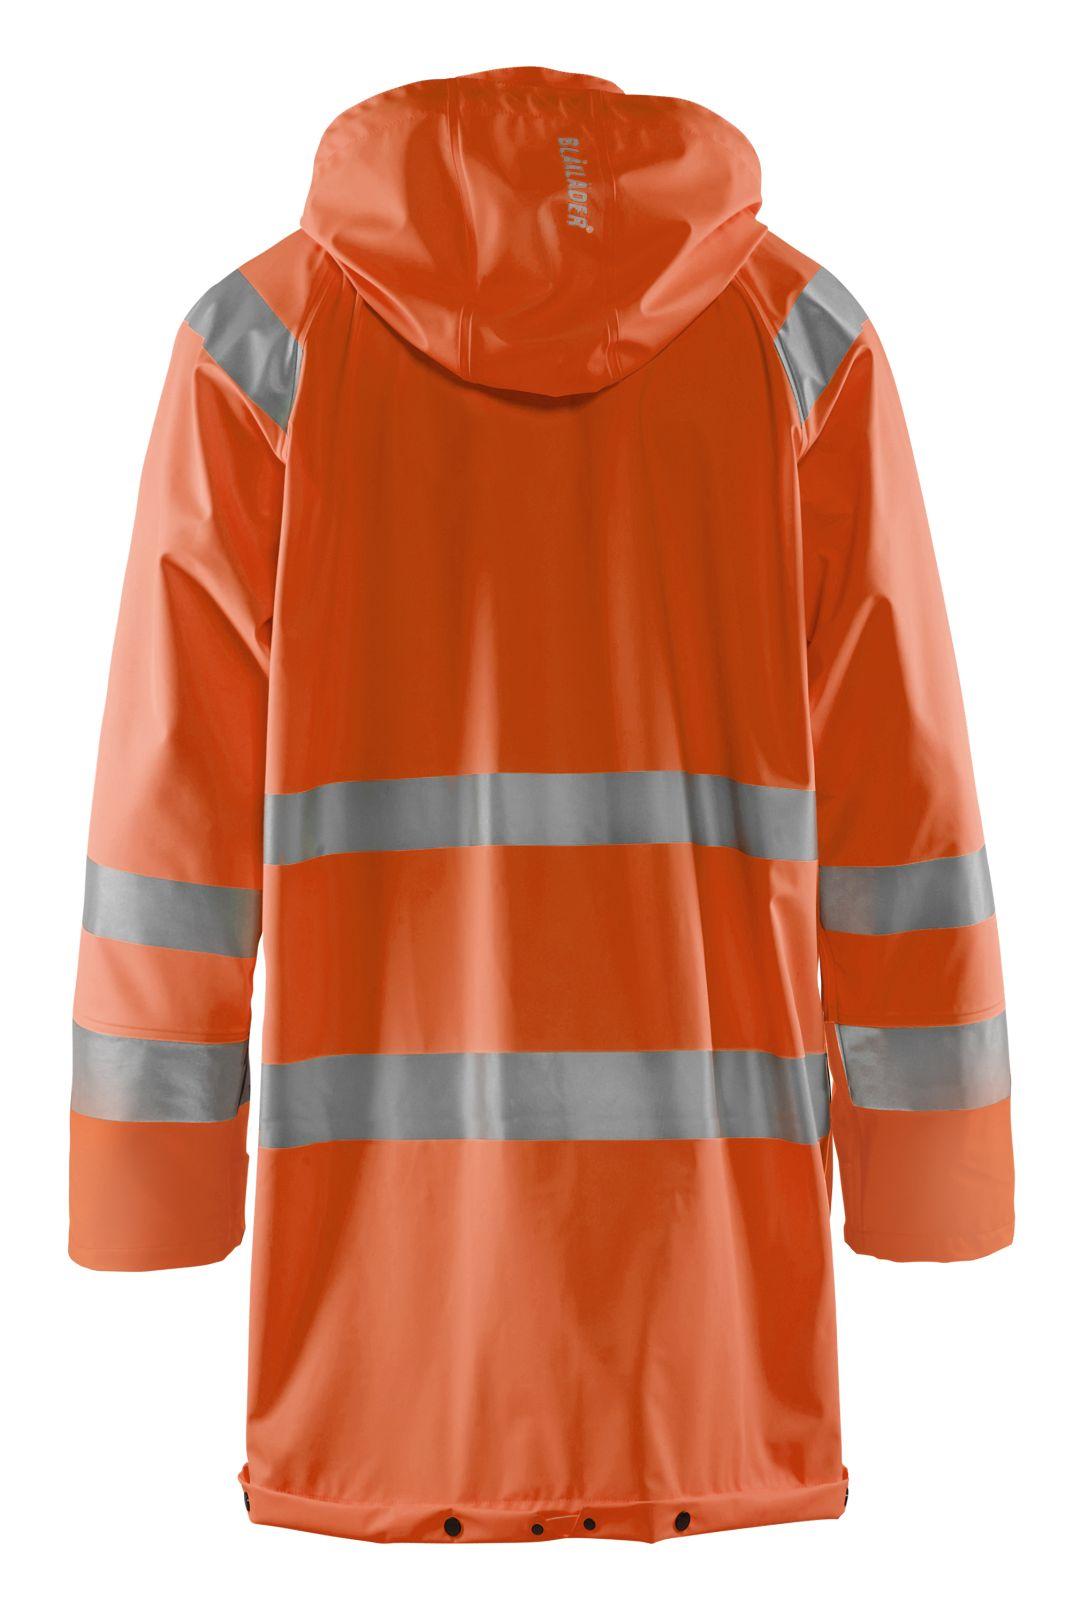 Blaklader Regenjassen 43242000 High Vis oranje(5300)